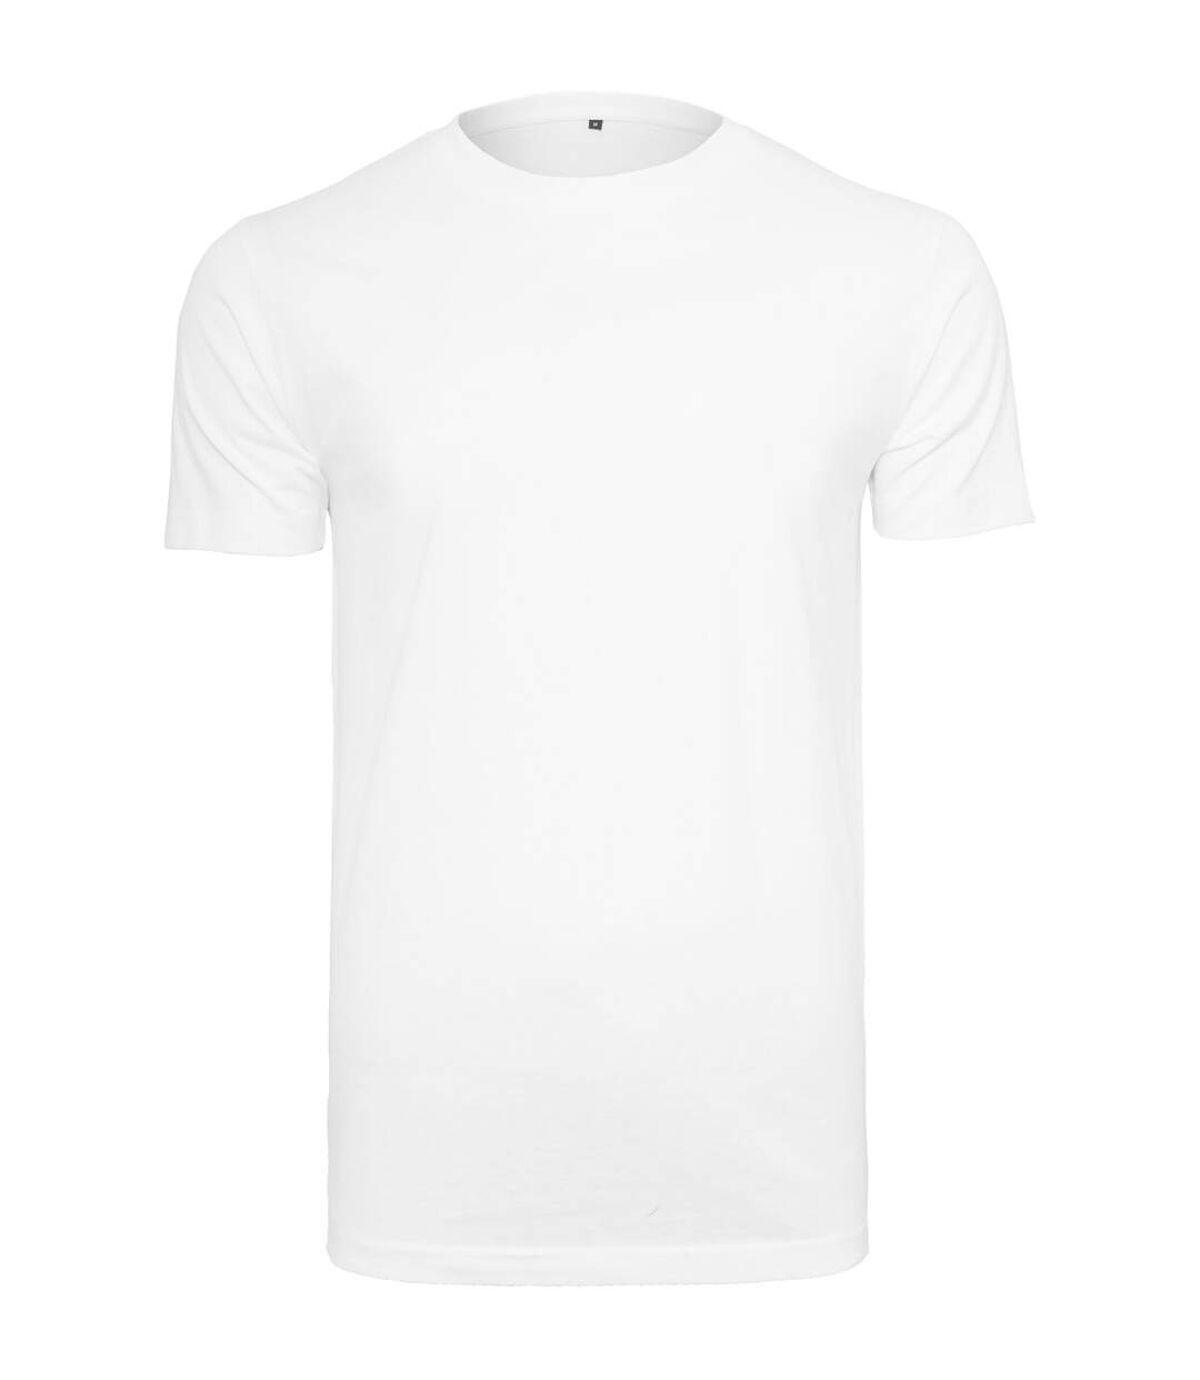 Build Your Brand Mens T-Shirt Round Neck (White) - UTRW5815